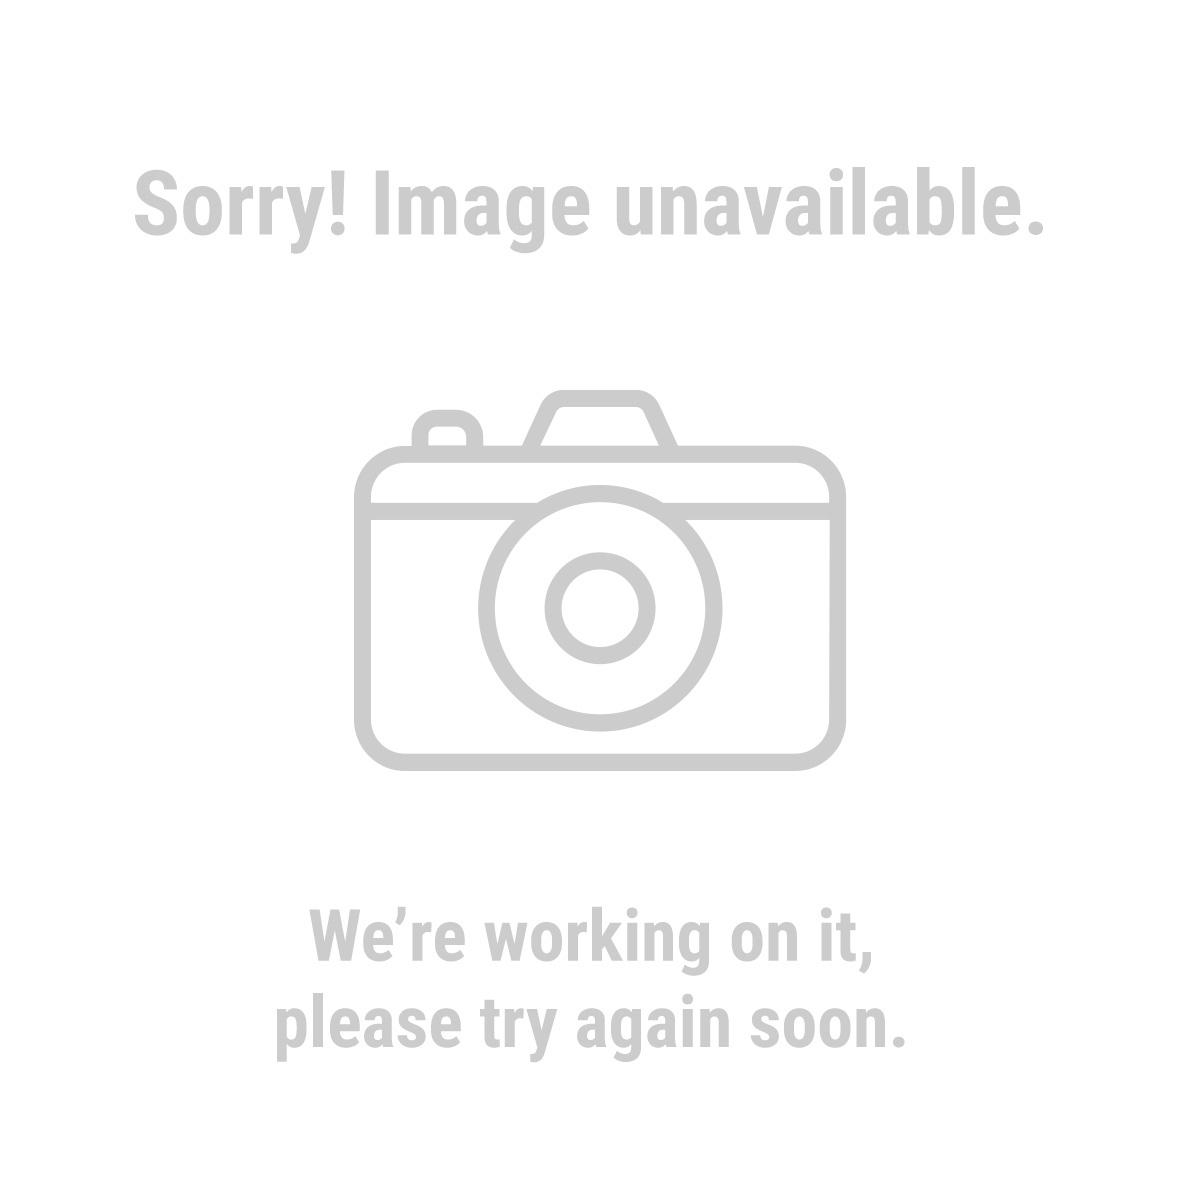 39655 Balsa Wood Puzzle - T Rex